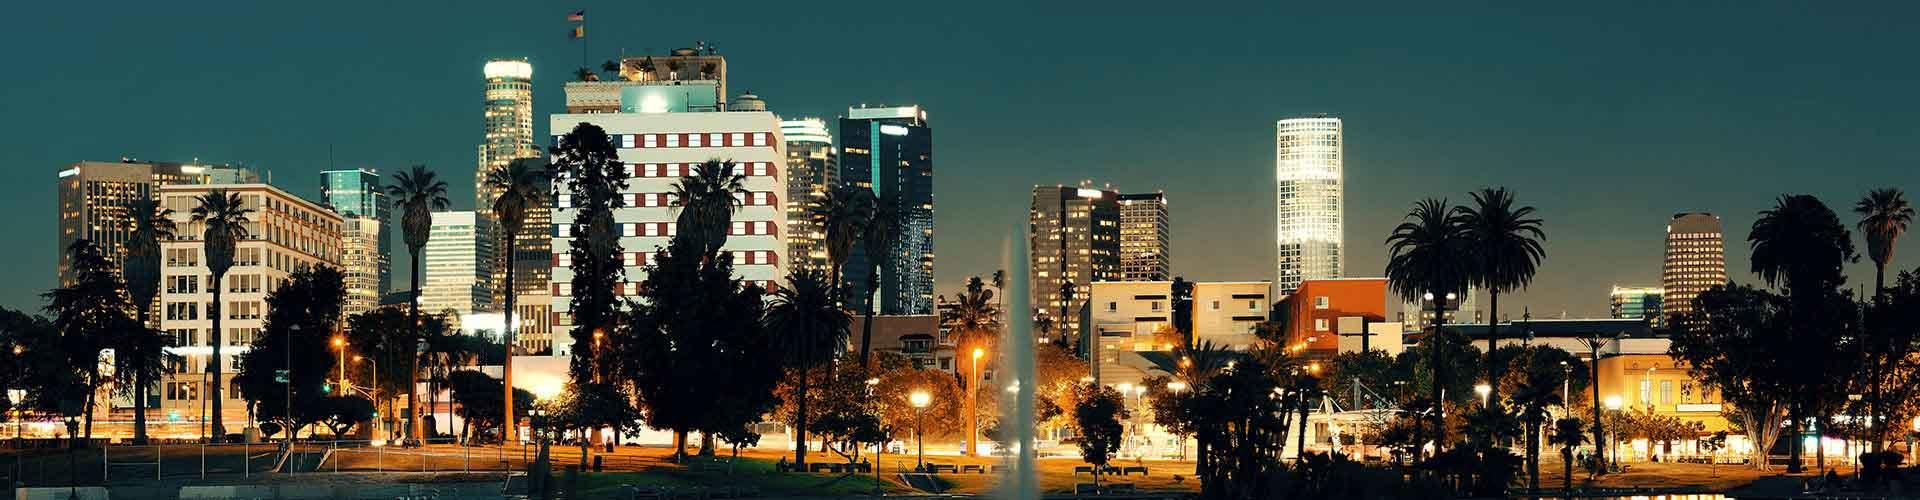 Los Angeles – Hostellit kohteessa Los Angeles. Los Angeles -karttoja, valokuvia ja arvosteluja kaikista Los Angeles -hostelleista.